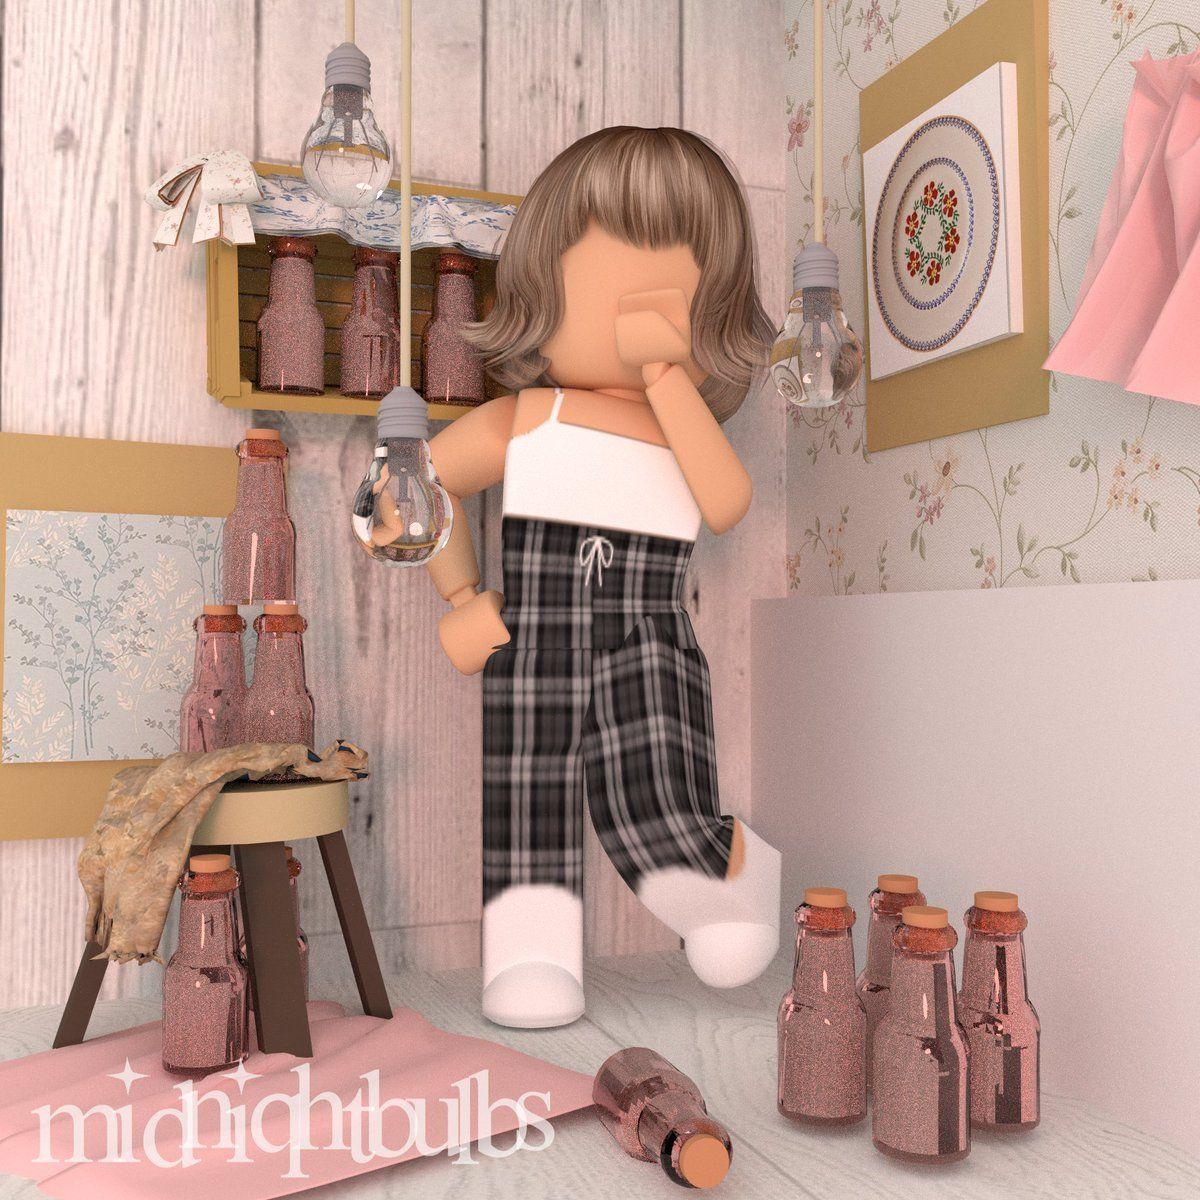 Gfx Roblox Aesthetic Girl In 2020 Roblox Cute Tumblr Wallpaper Roblox Animation